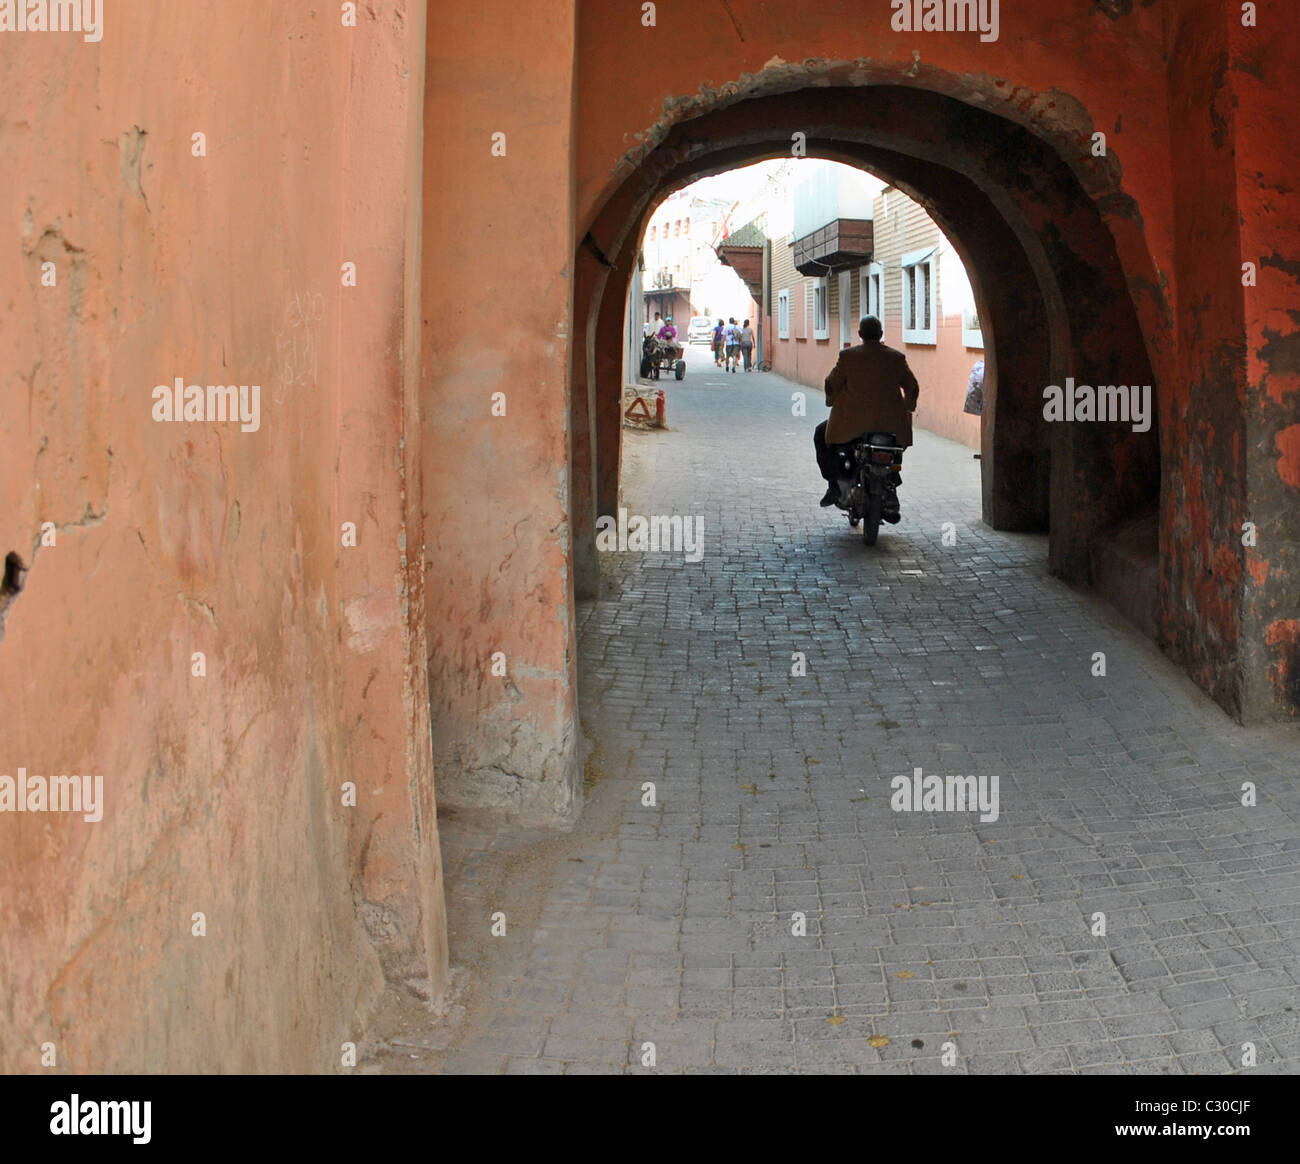 Man driving motorbike in Marrakesh, Morocco - Stock Image